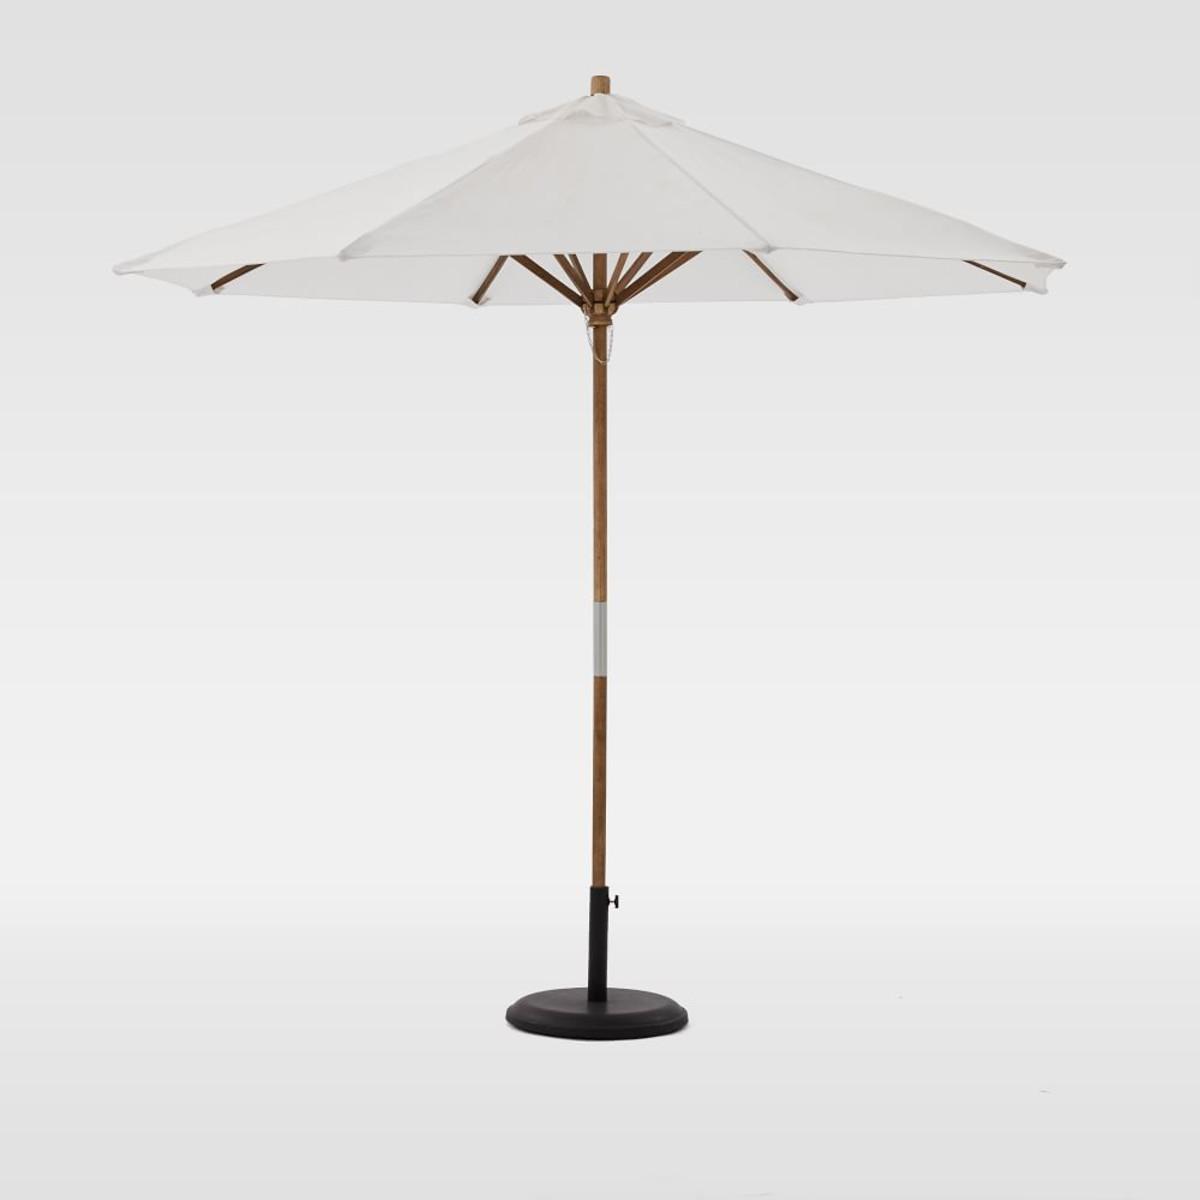 round-wooden-umbrella-white-z-silo-alt4